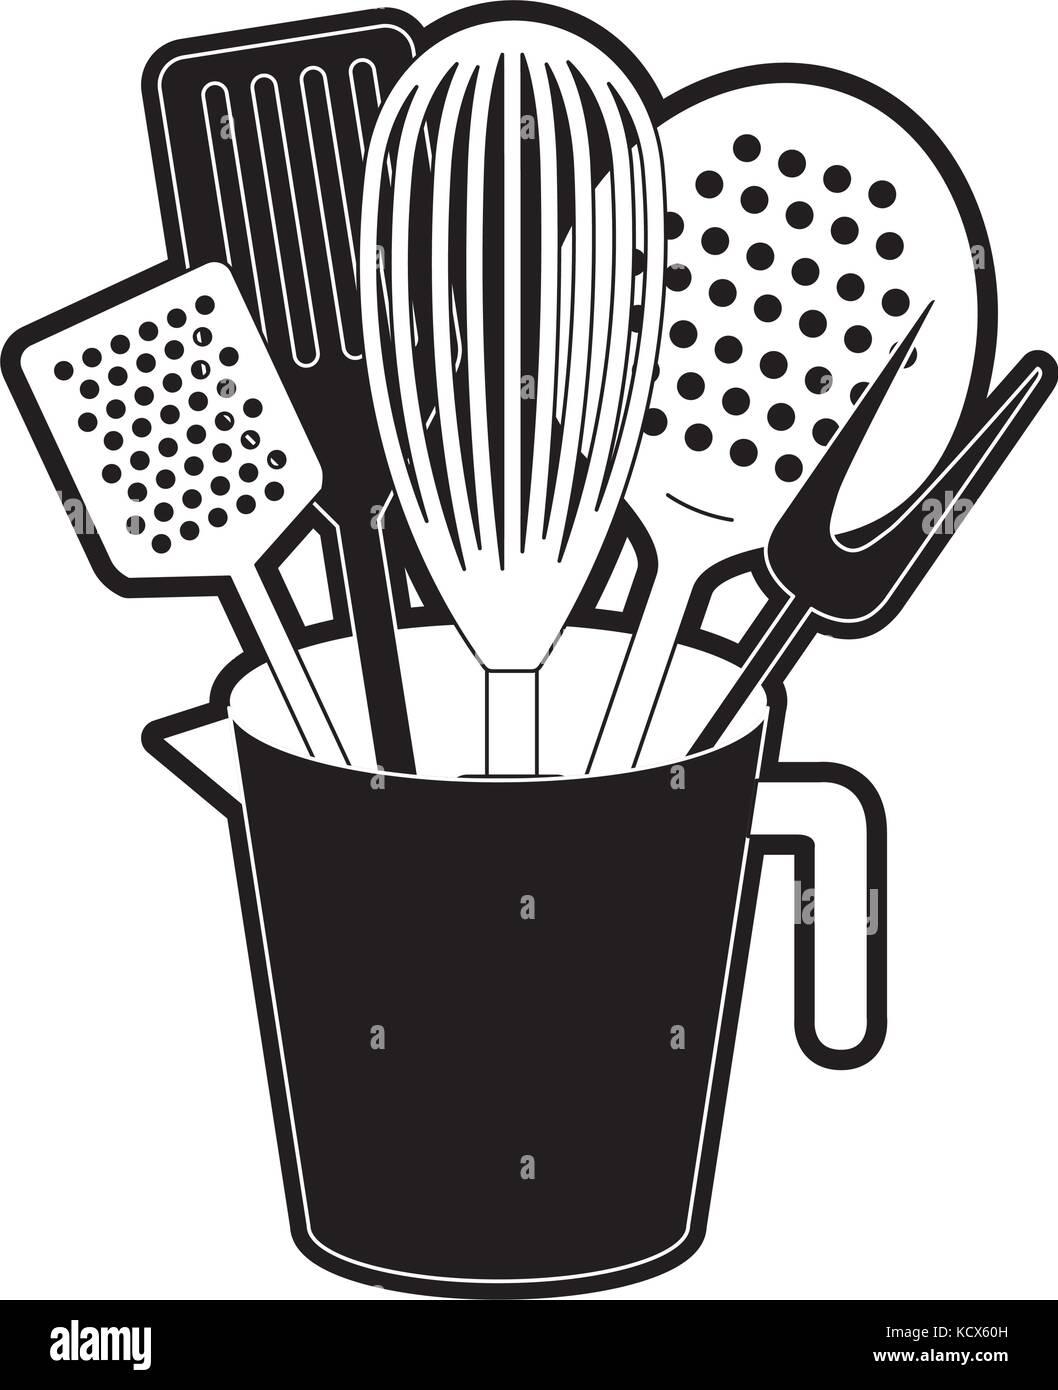 jar with kitchen utensils black silhouette - Stock Vector